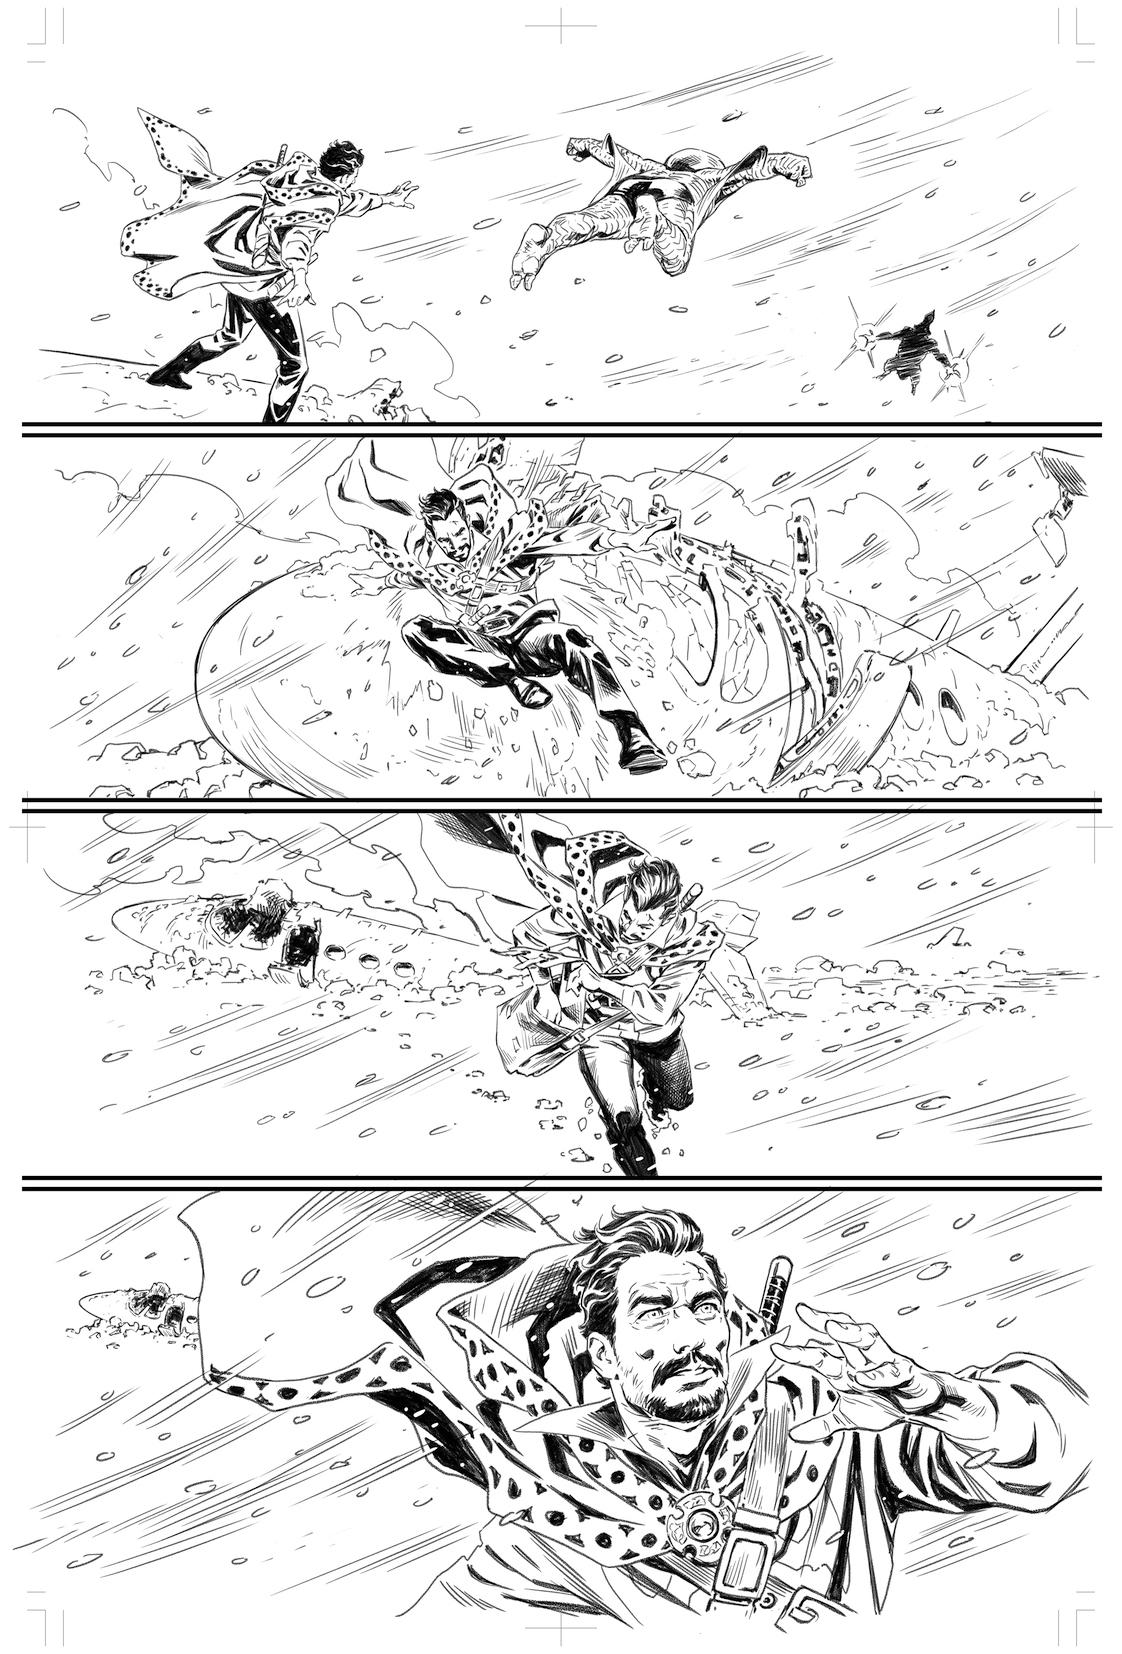 Monsters Unleashed - Dr. Strange page 16